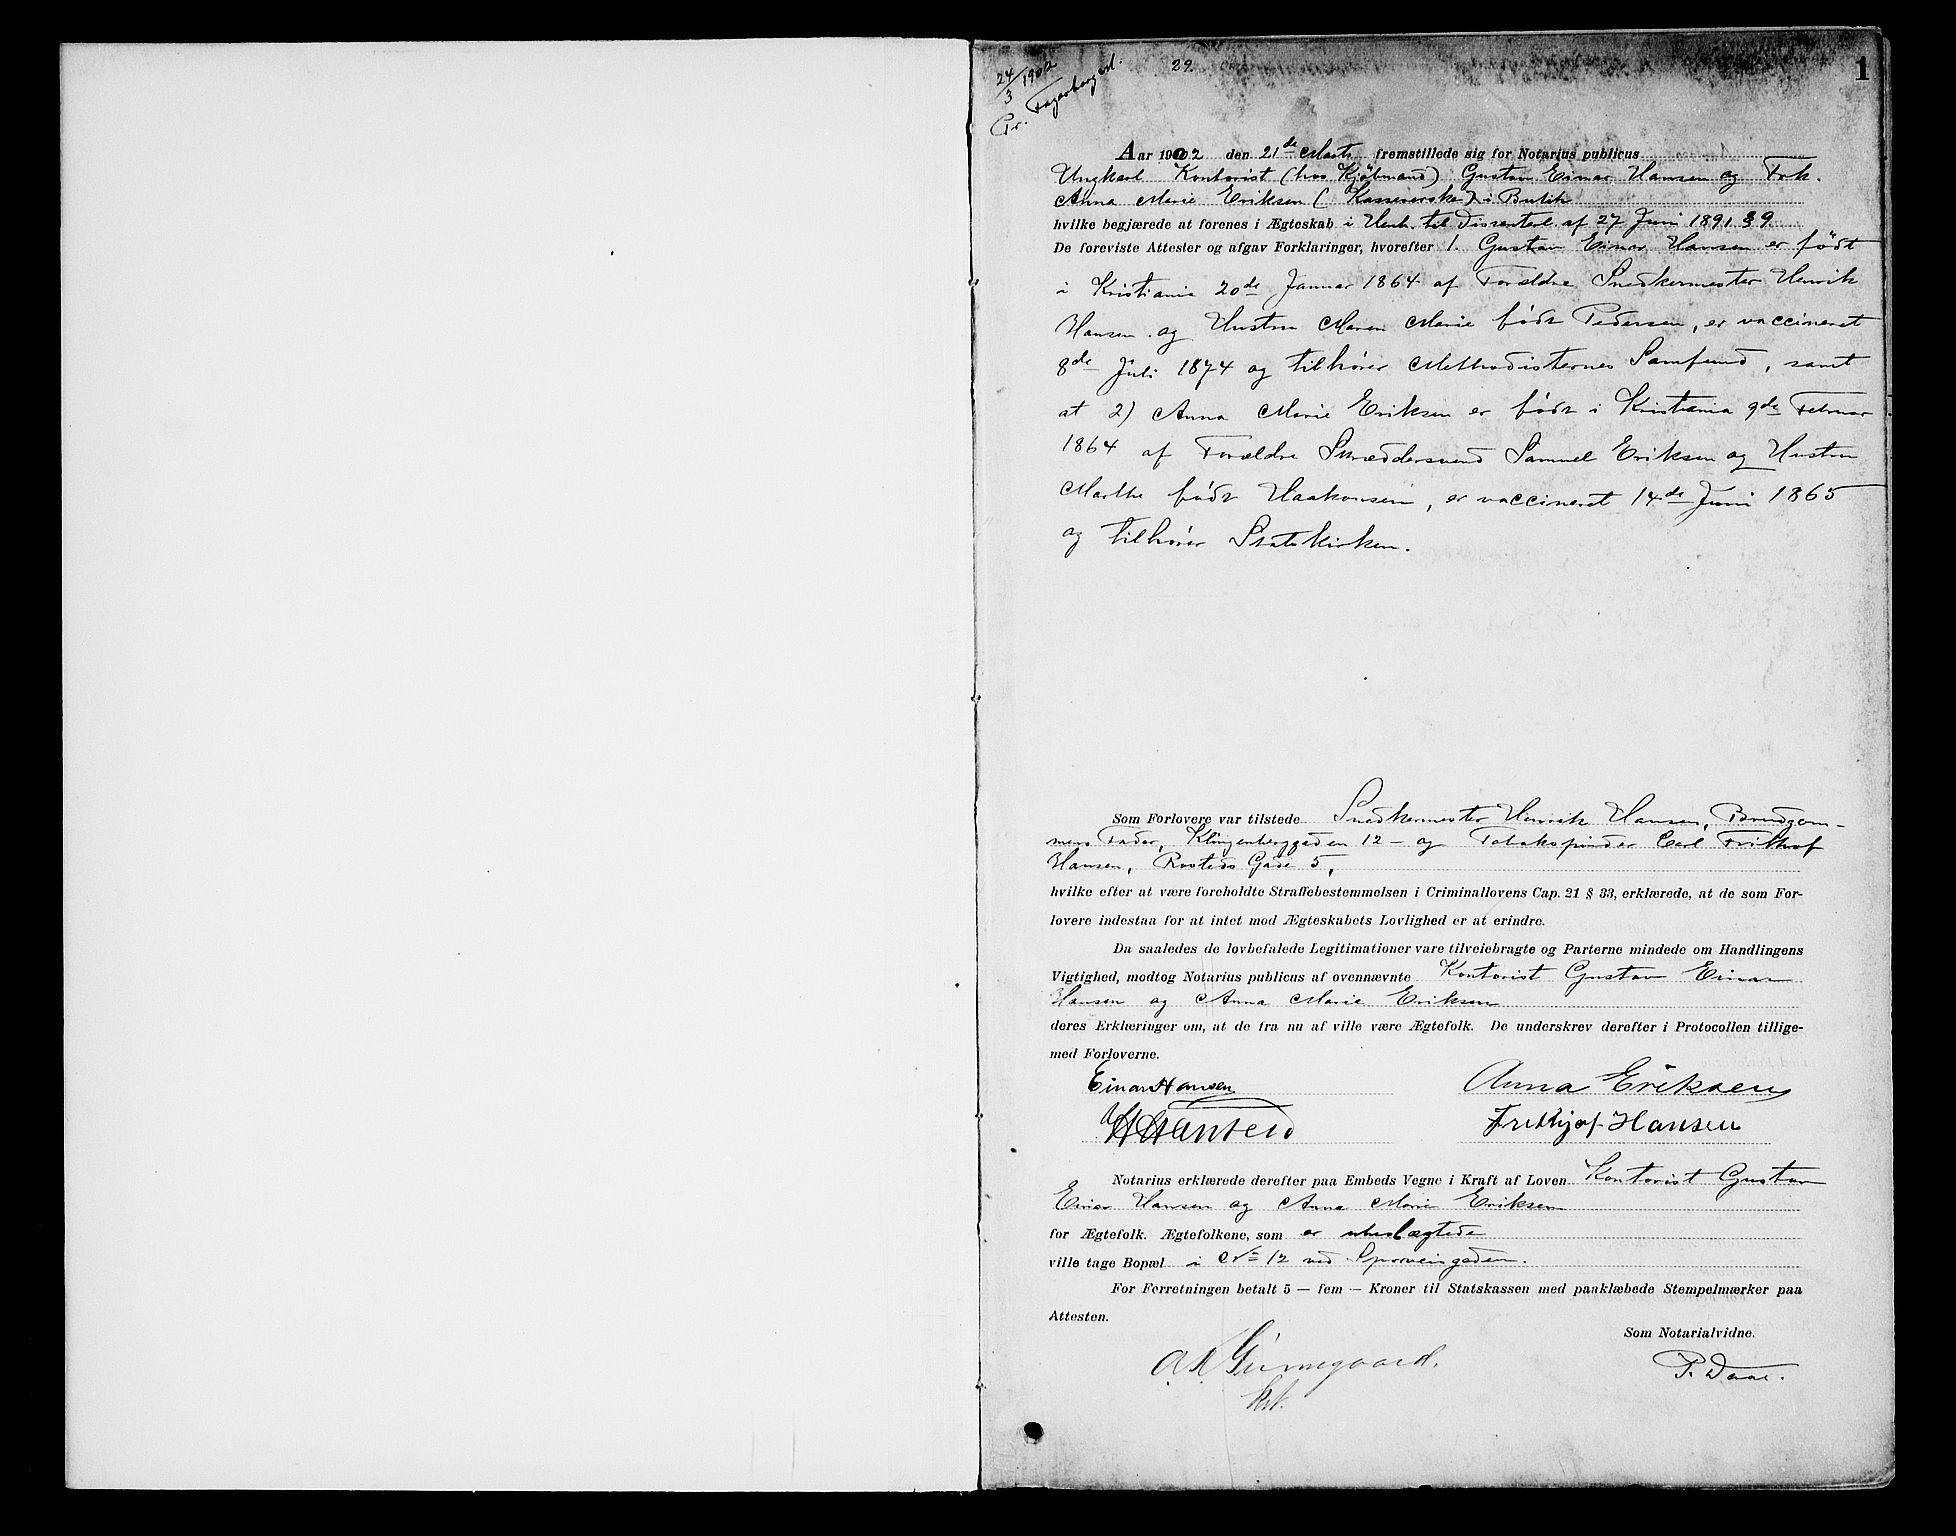 SAO, Oslo byfogd avd. I, L/Lb/Lbb/L0006: Notarialprotokoll, rekke II: Vigsler, 1902-1907, s. 1a